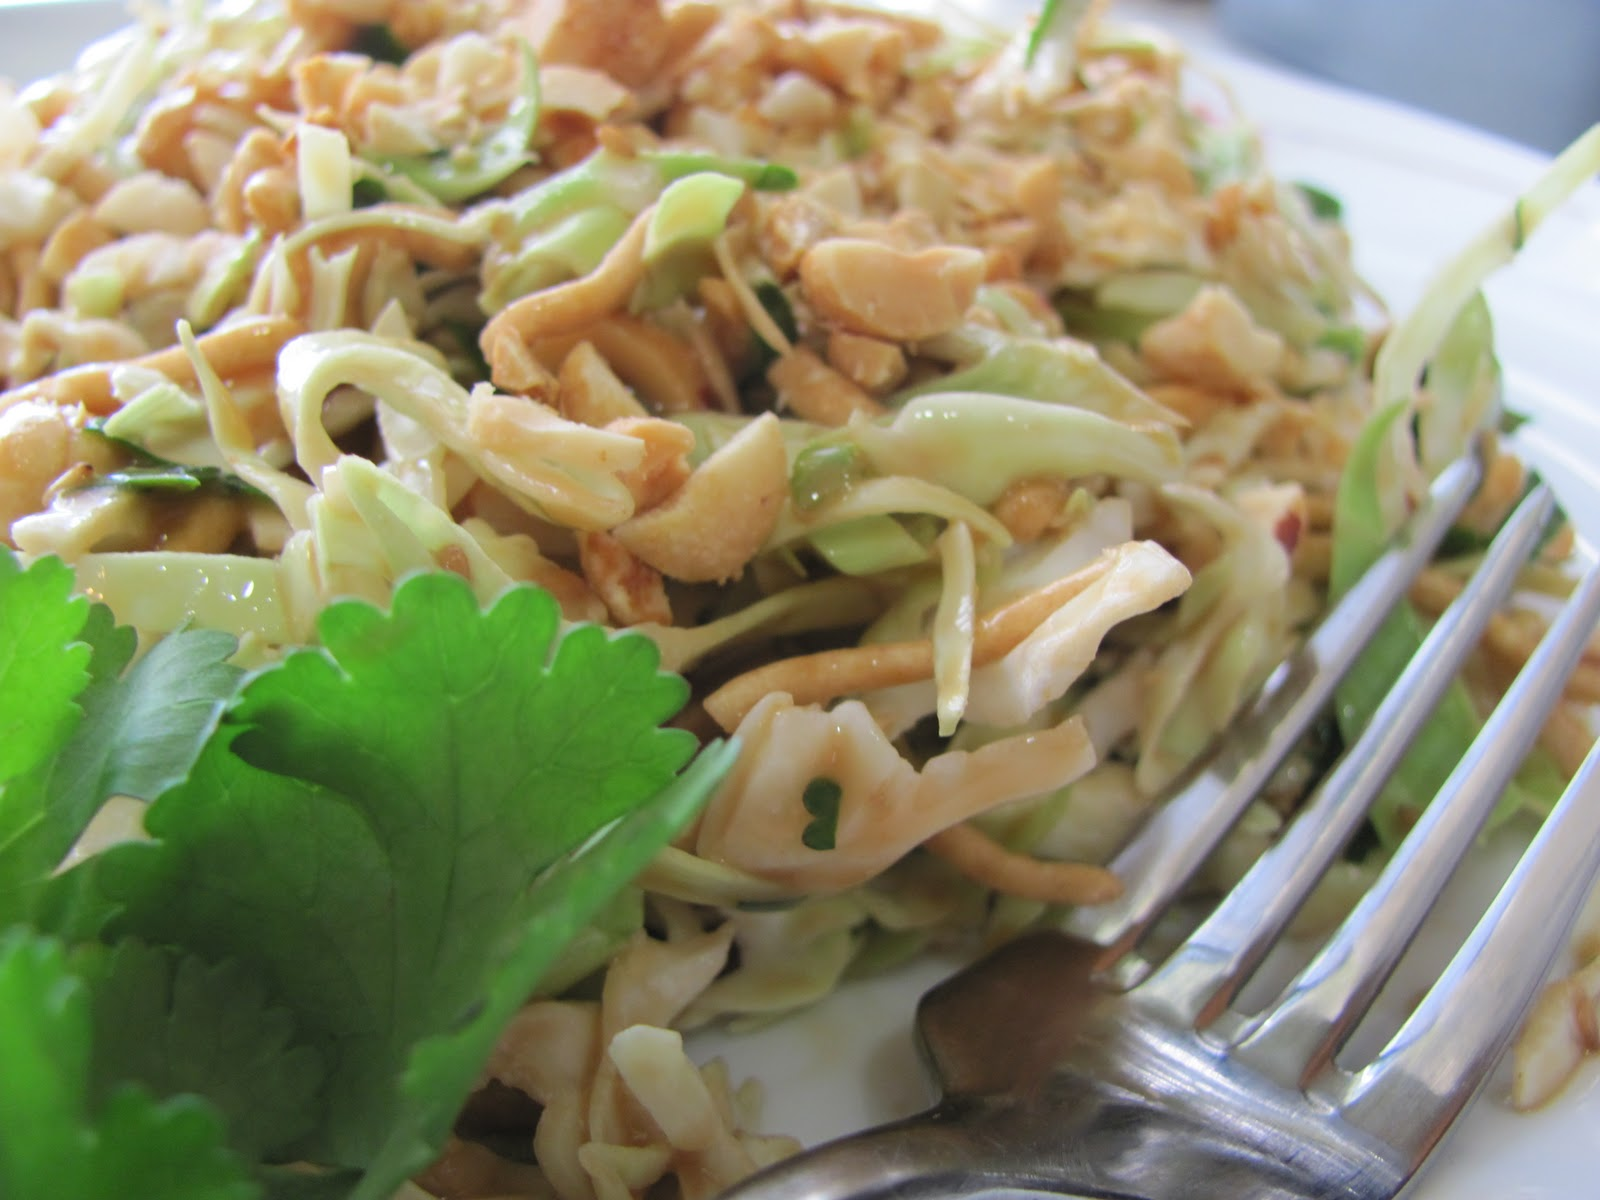 Running Upward: Homemade Thai Crunch Salad (seriously, MAKE THIS!!)